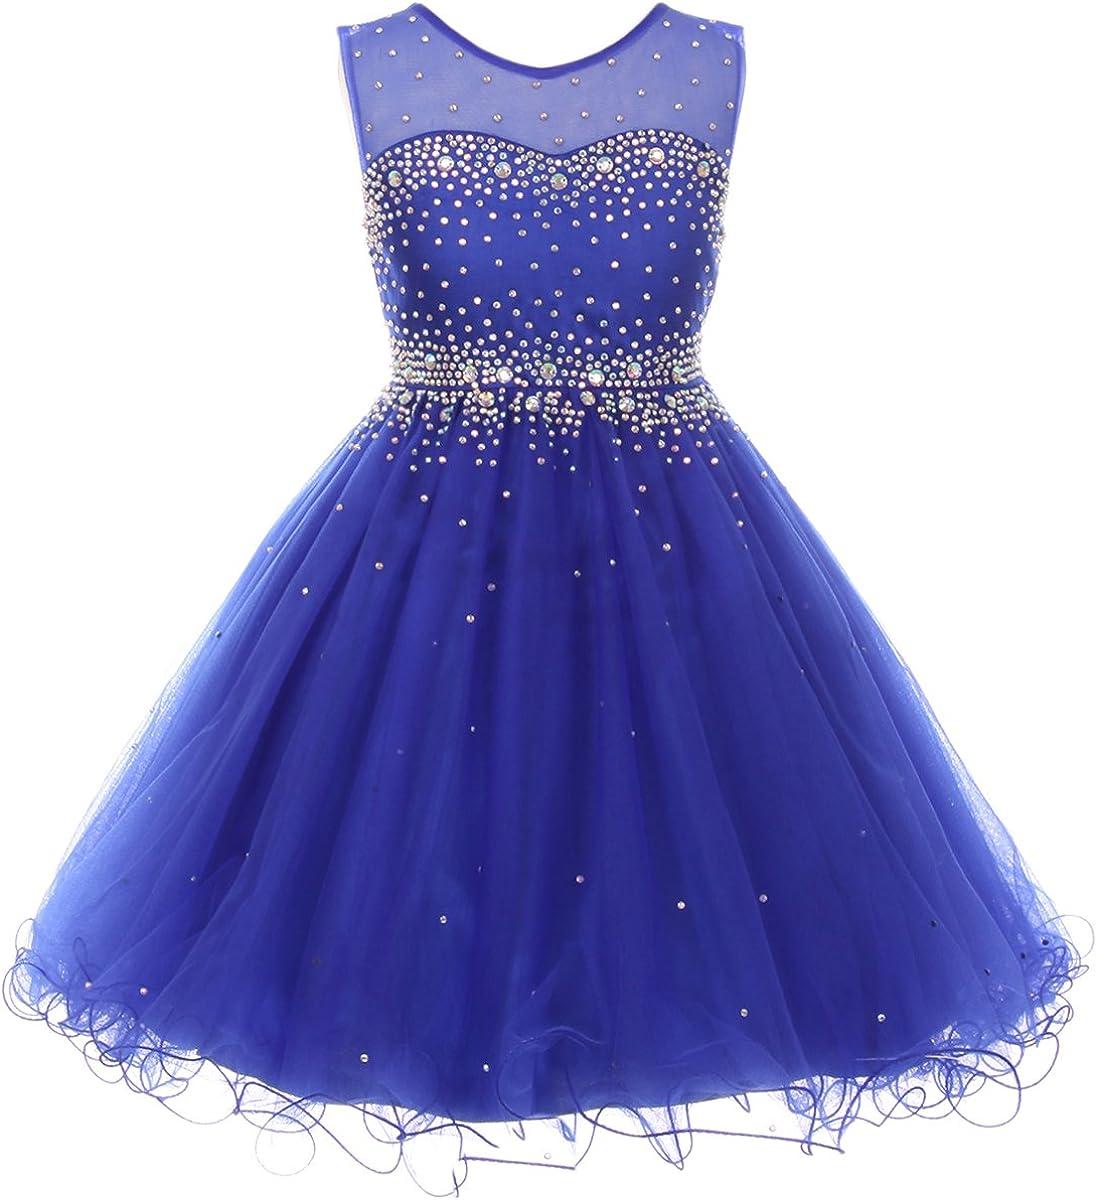 CrunchyCucumber Sparkling Rhinestones Illusion Flower Girl Dress